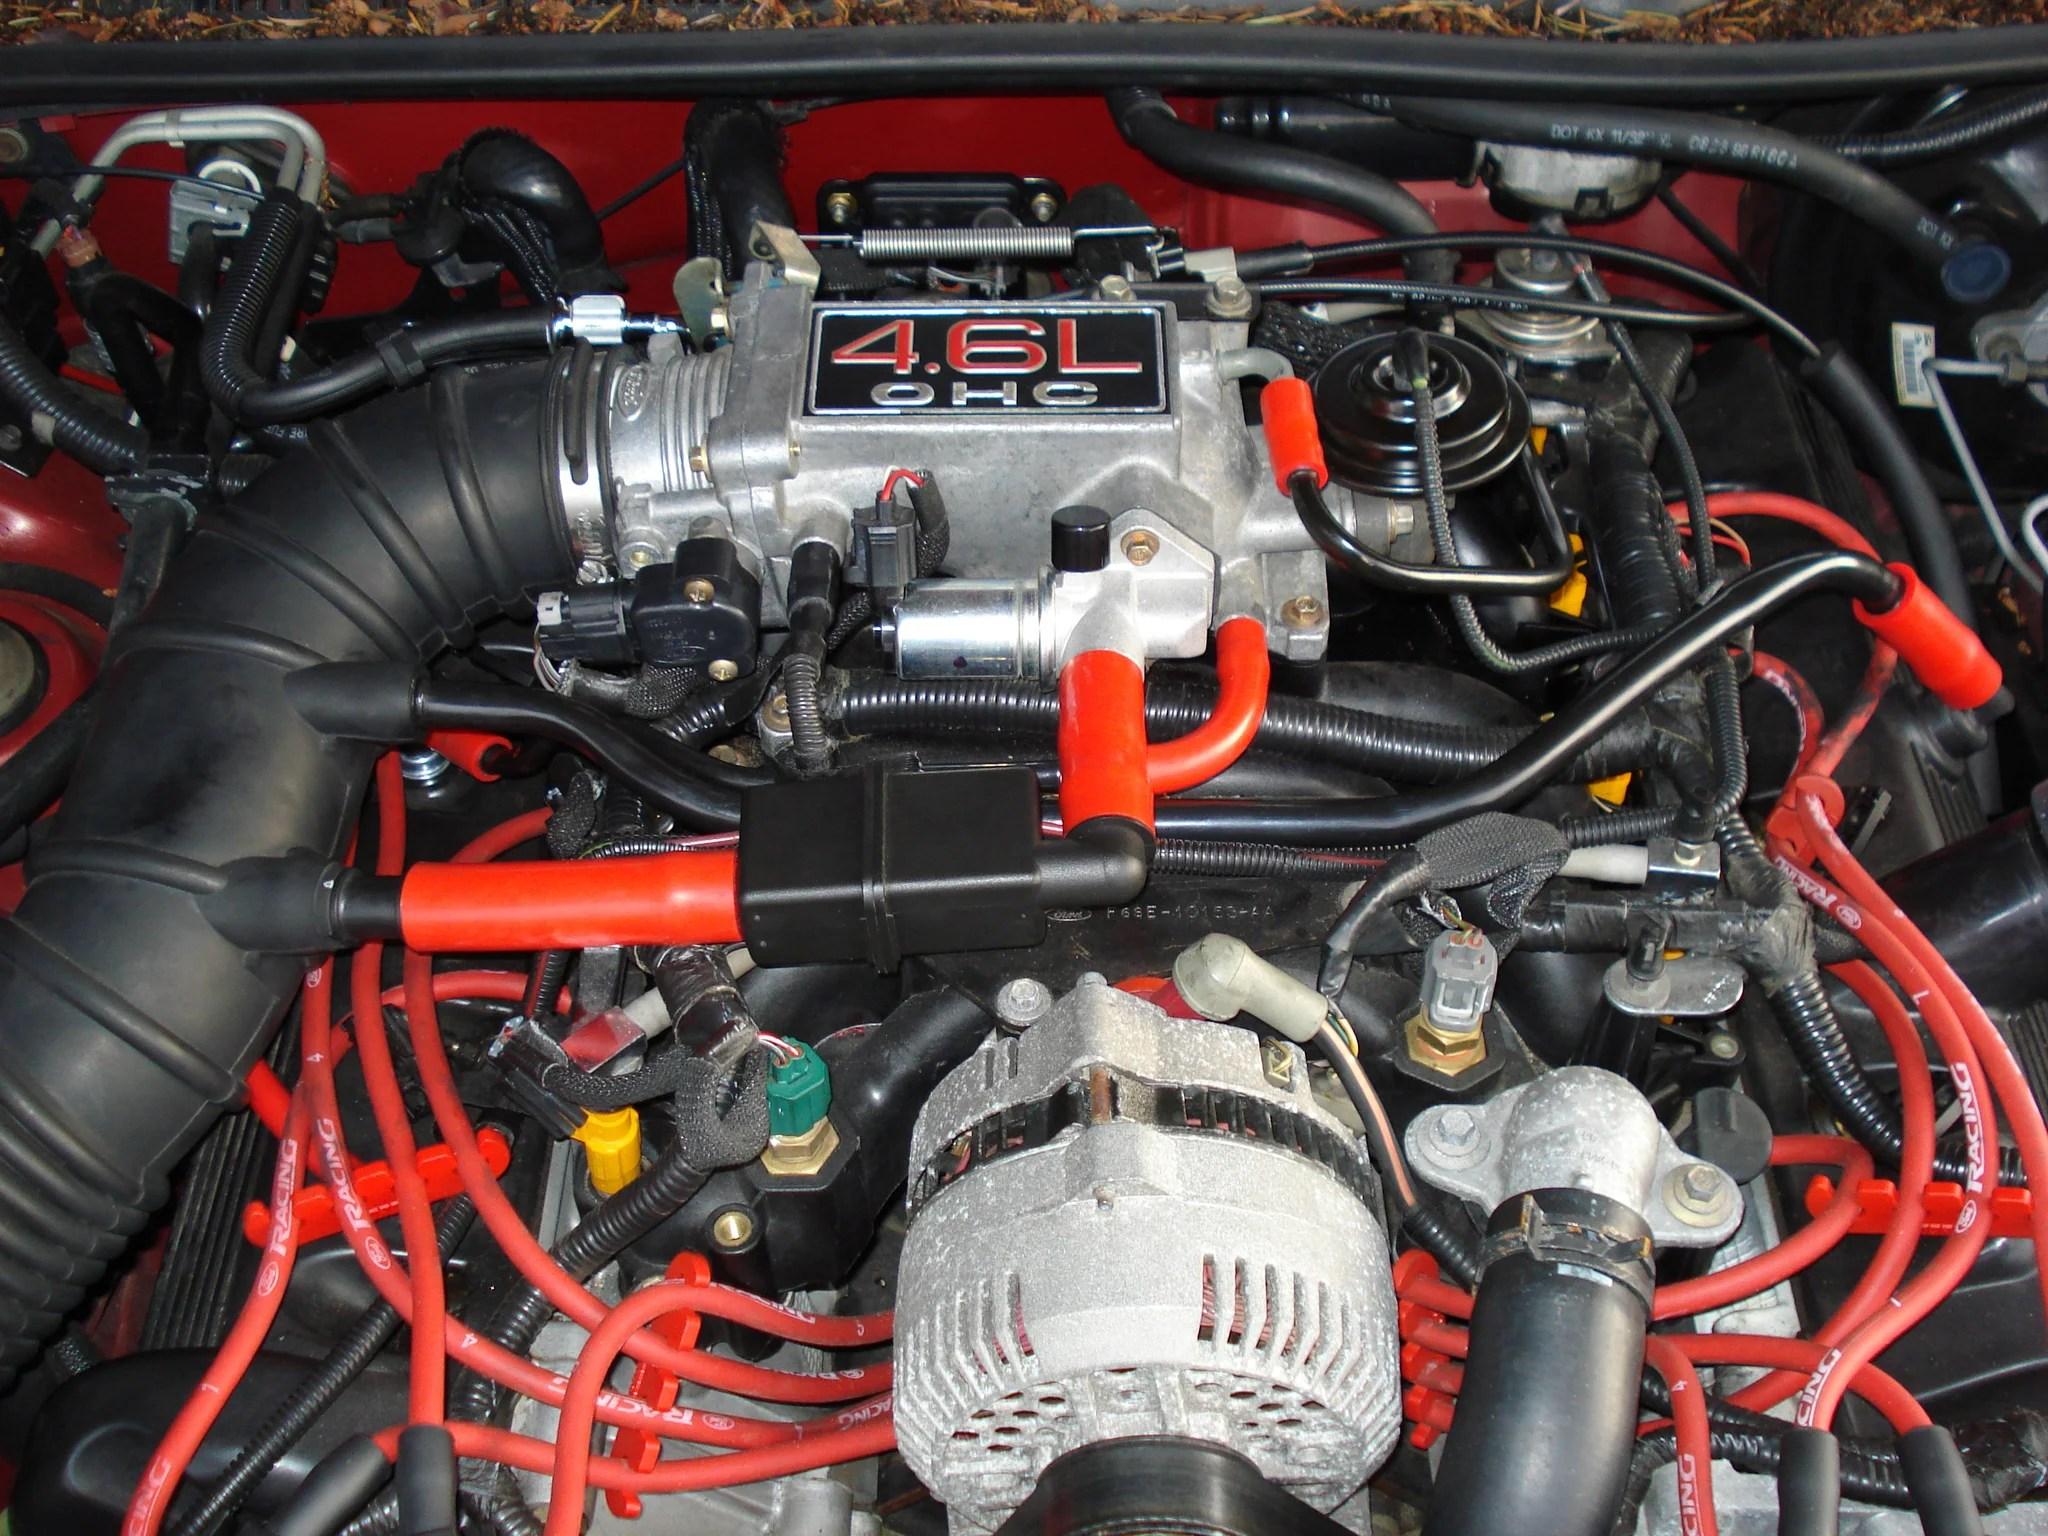 medium resolution of hpsi silicone vacuum hose kit ford thunderbird v8 4 6 liter 1994 1997